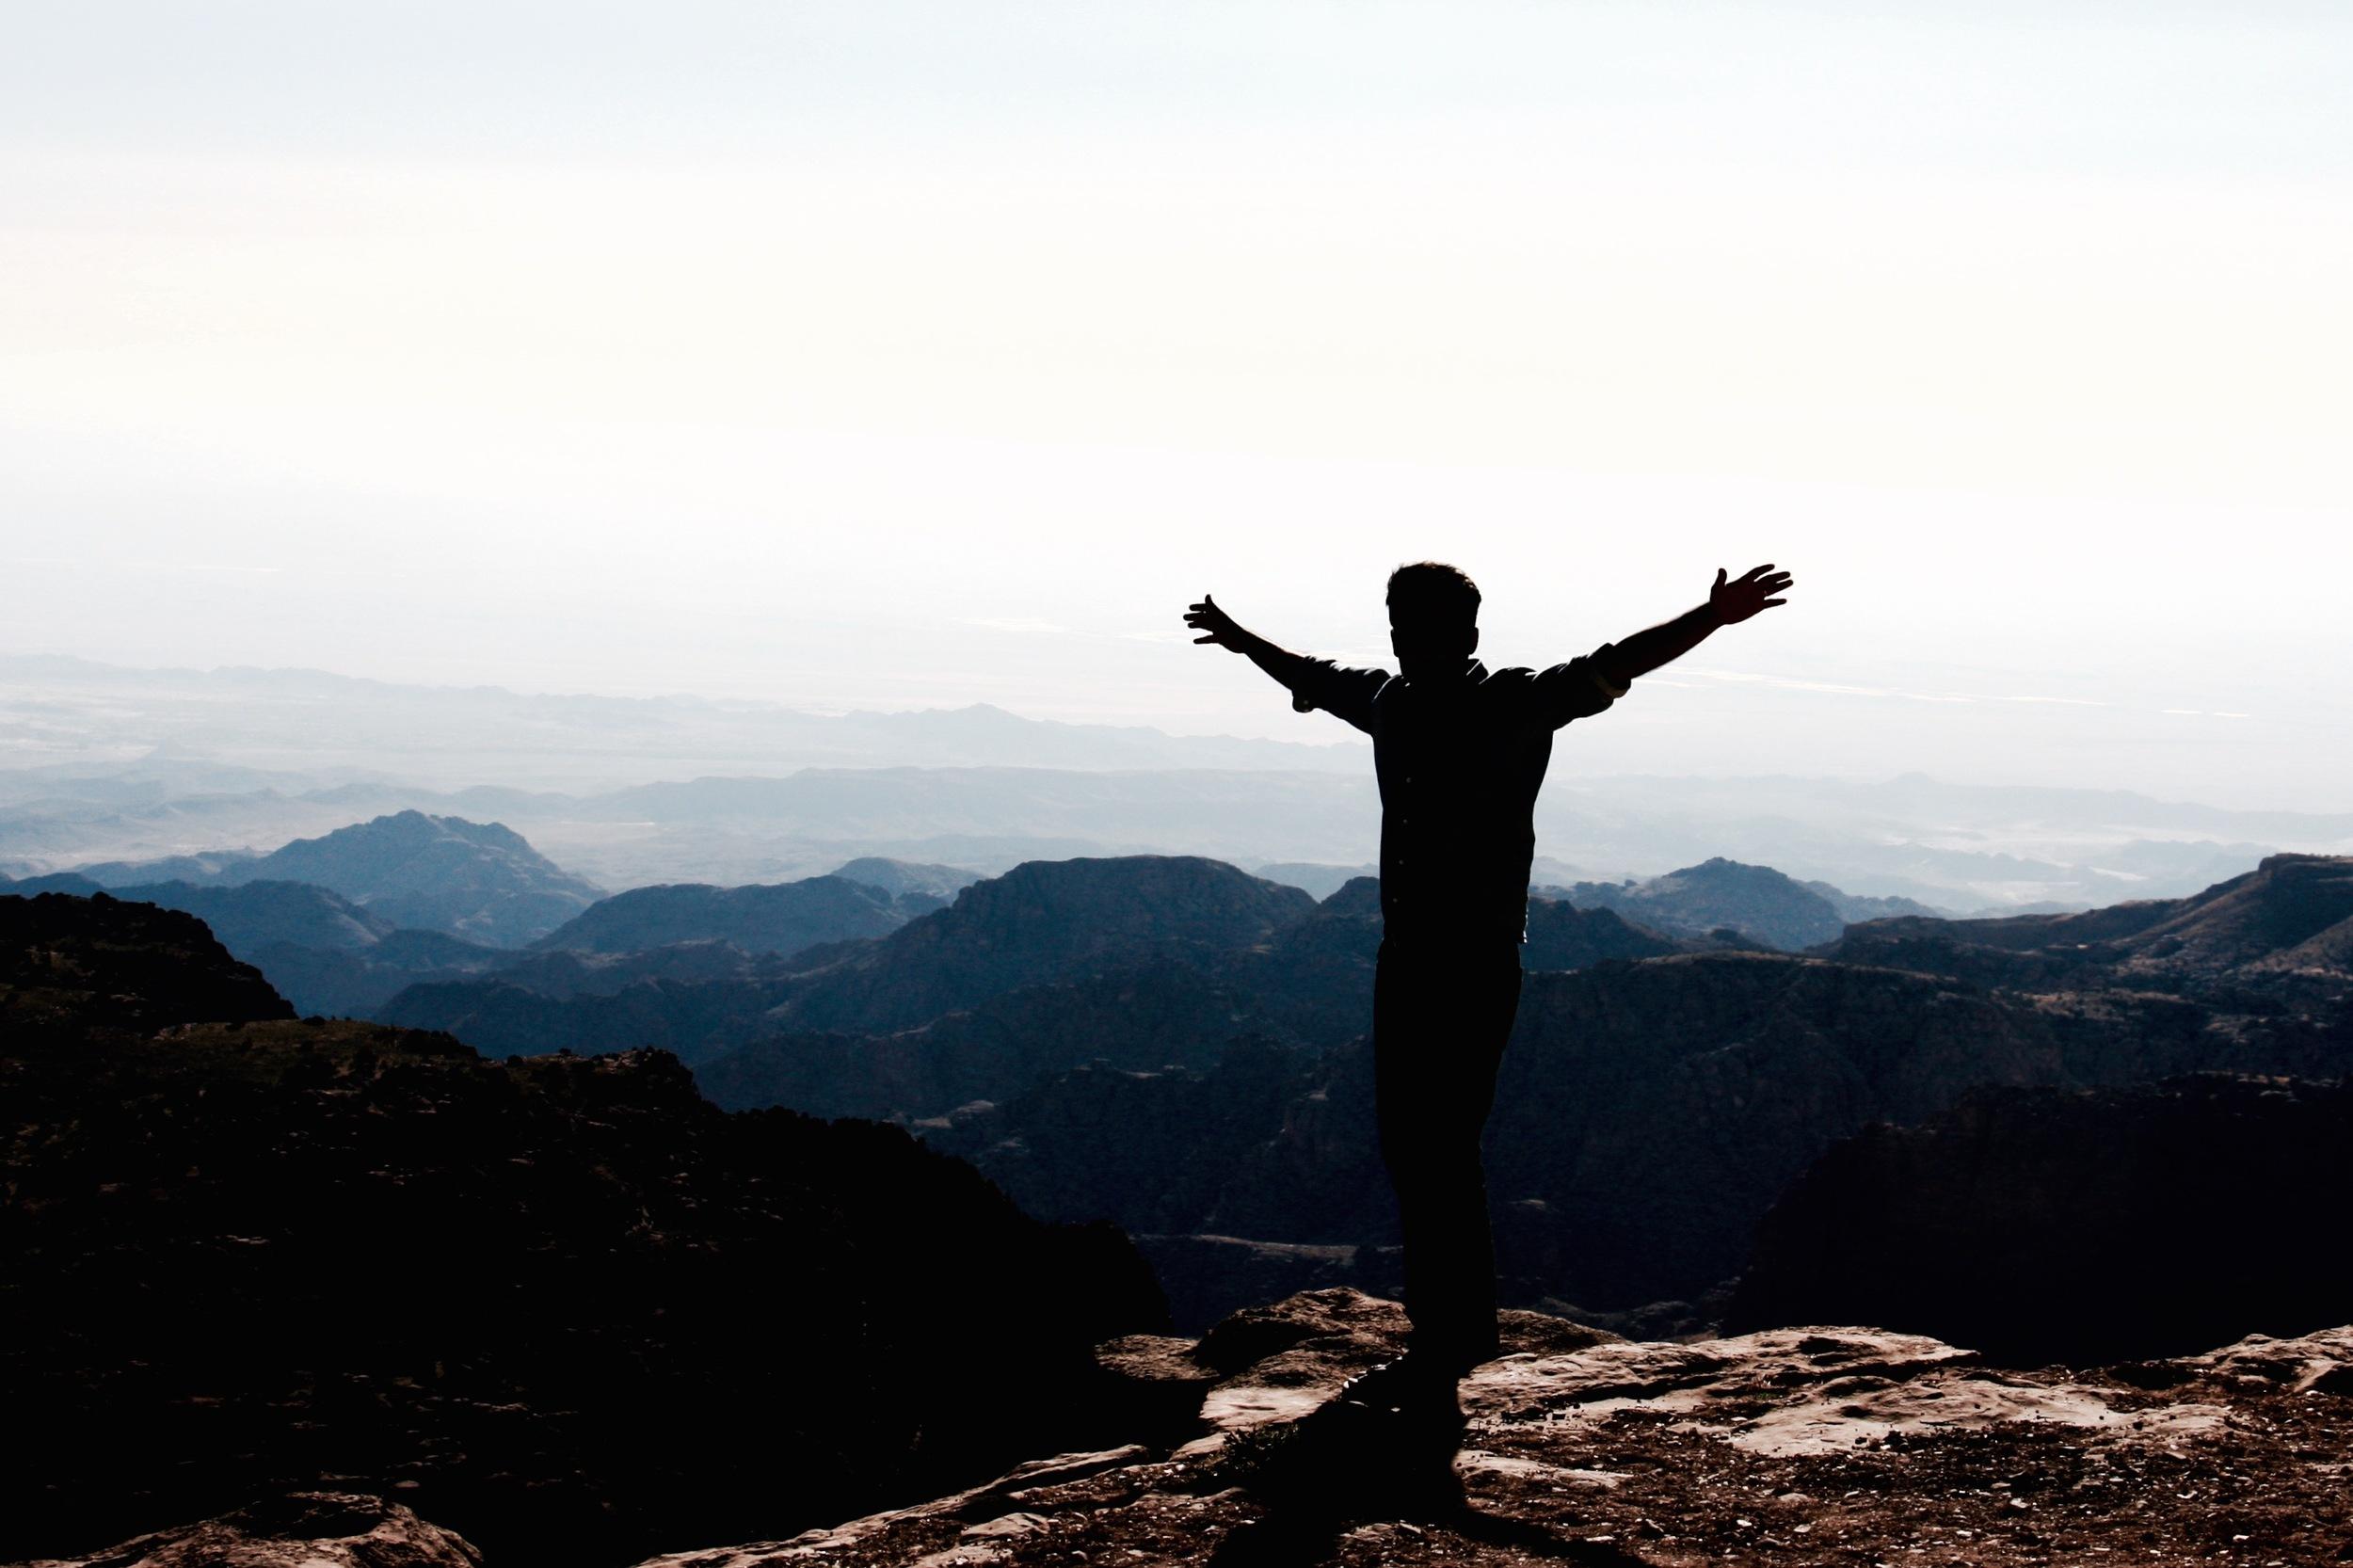 Silhouetted Man,Jordan Highlands - 3 Days*